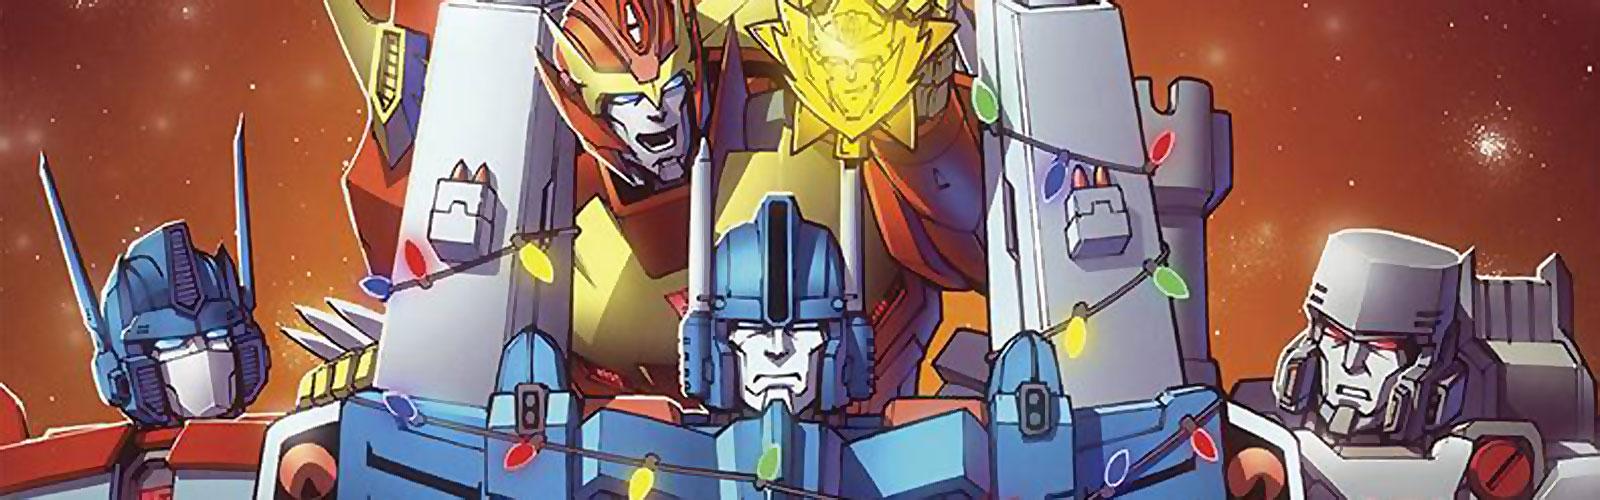 Illuminations 2015 10: Transformers